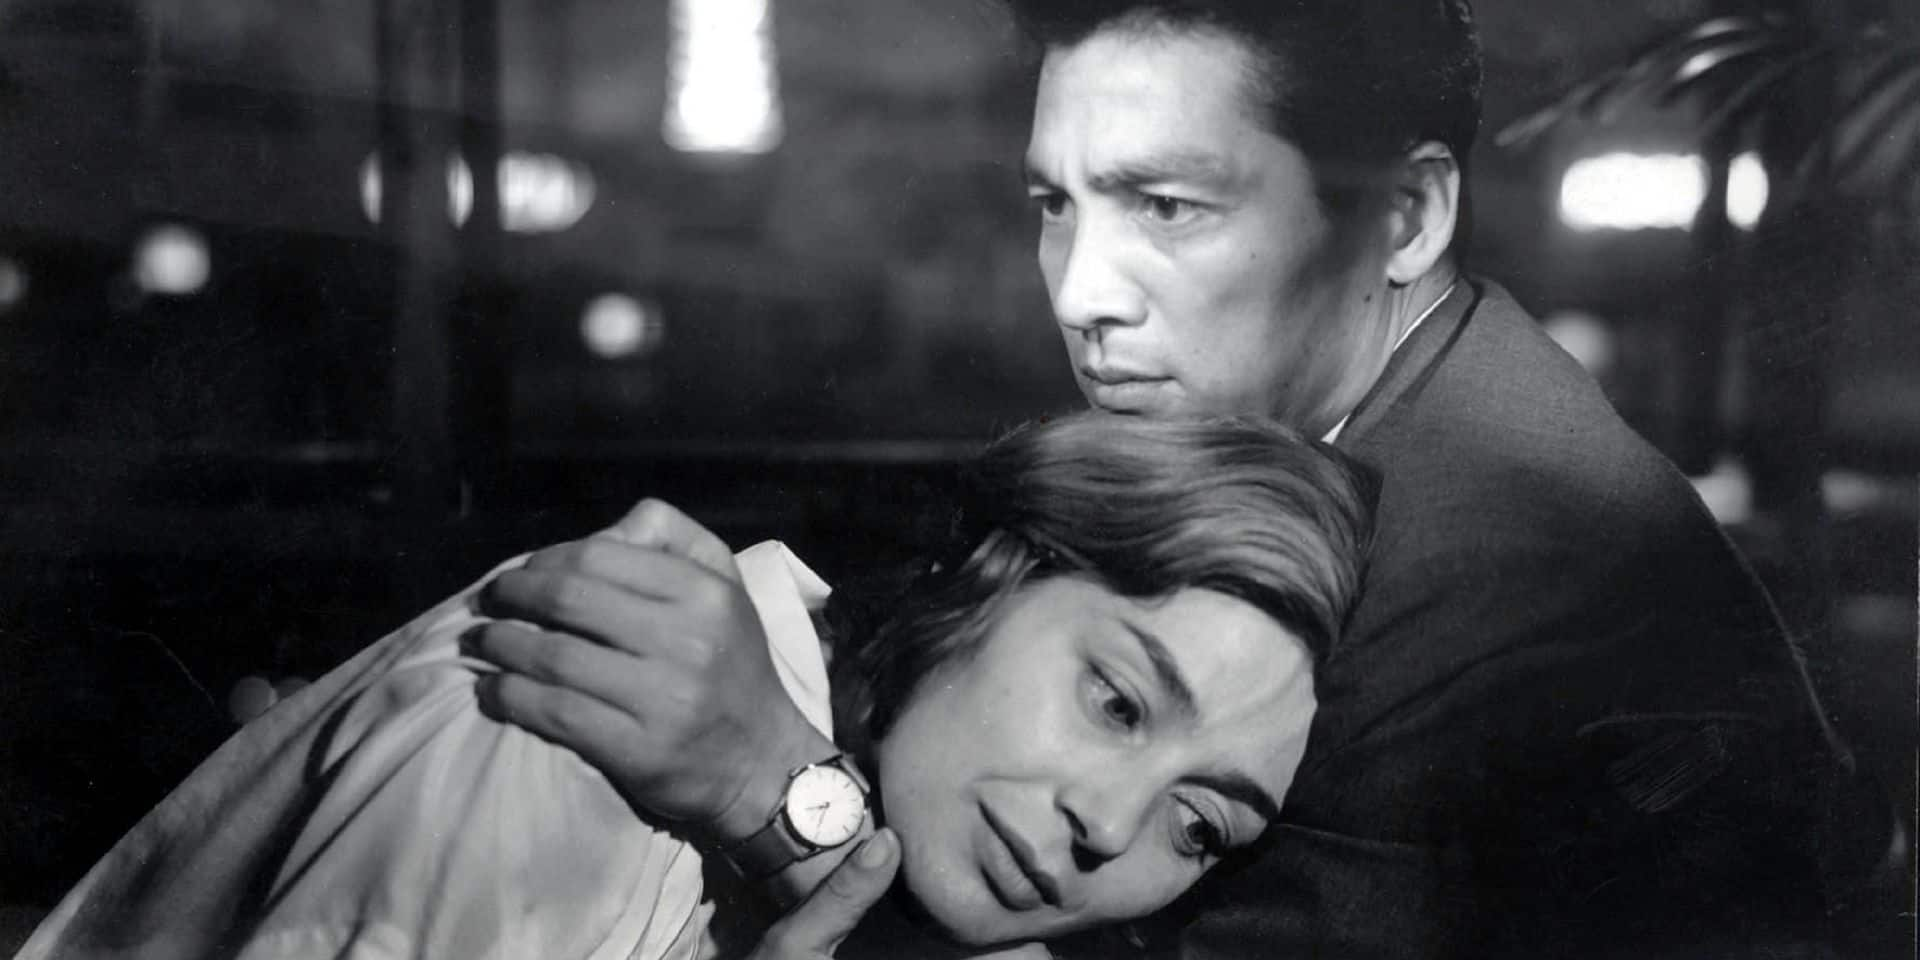 hiroshima mon amour Emmanuelle Riva, Eiji Okada Directed by Alain Resnais E.PP